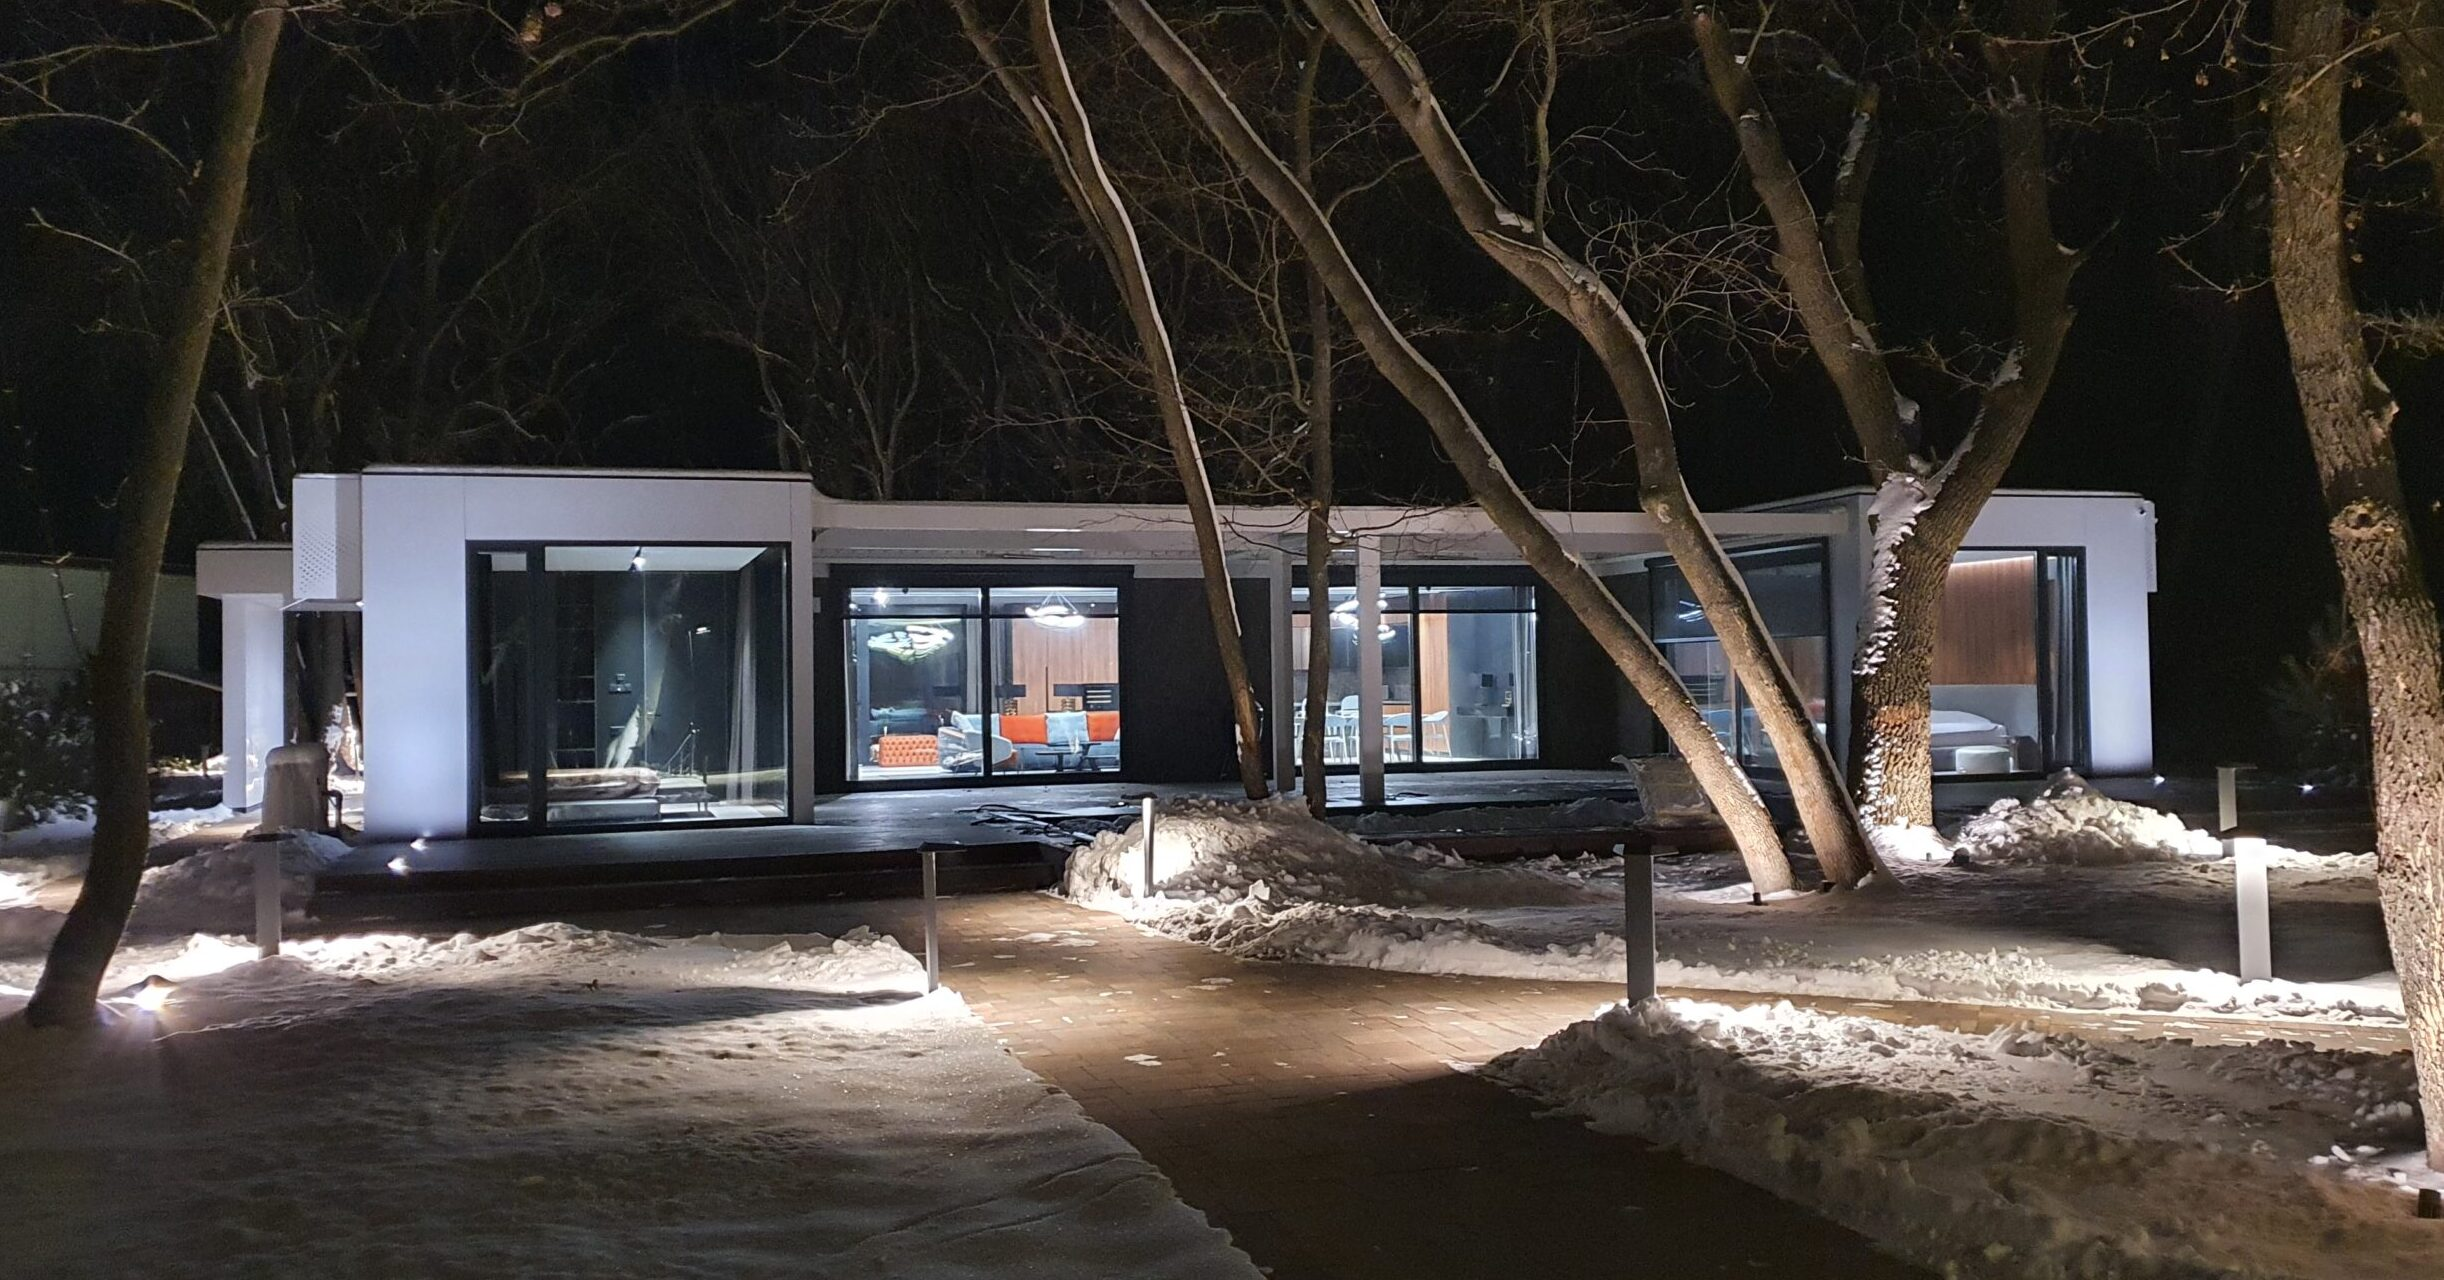 купить модульный дом, придбати модульний будинок module house.